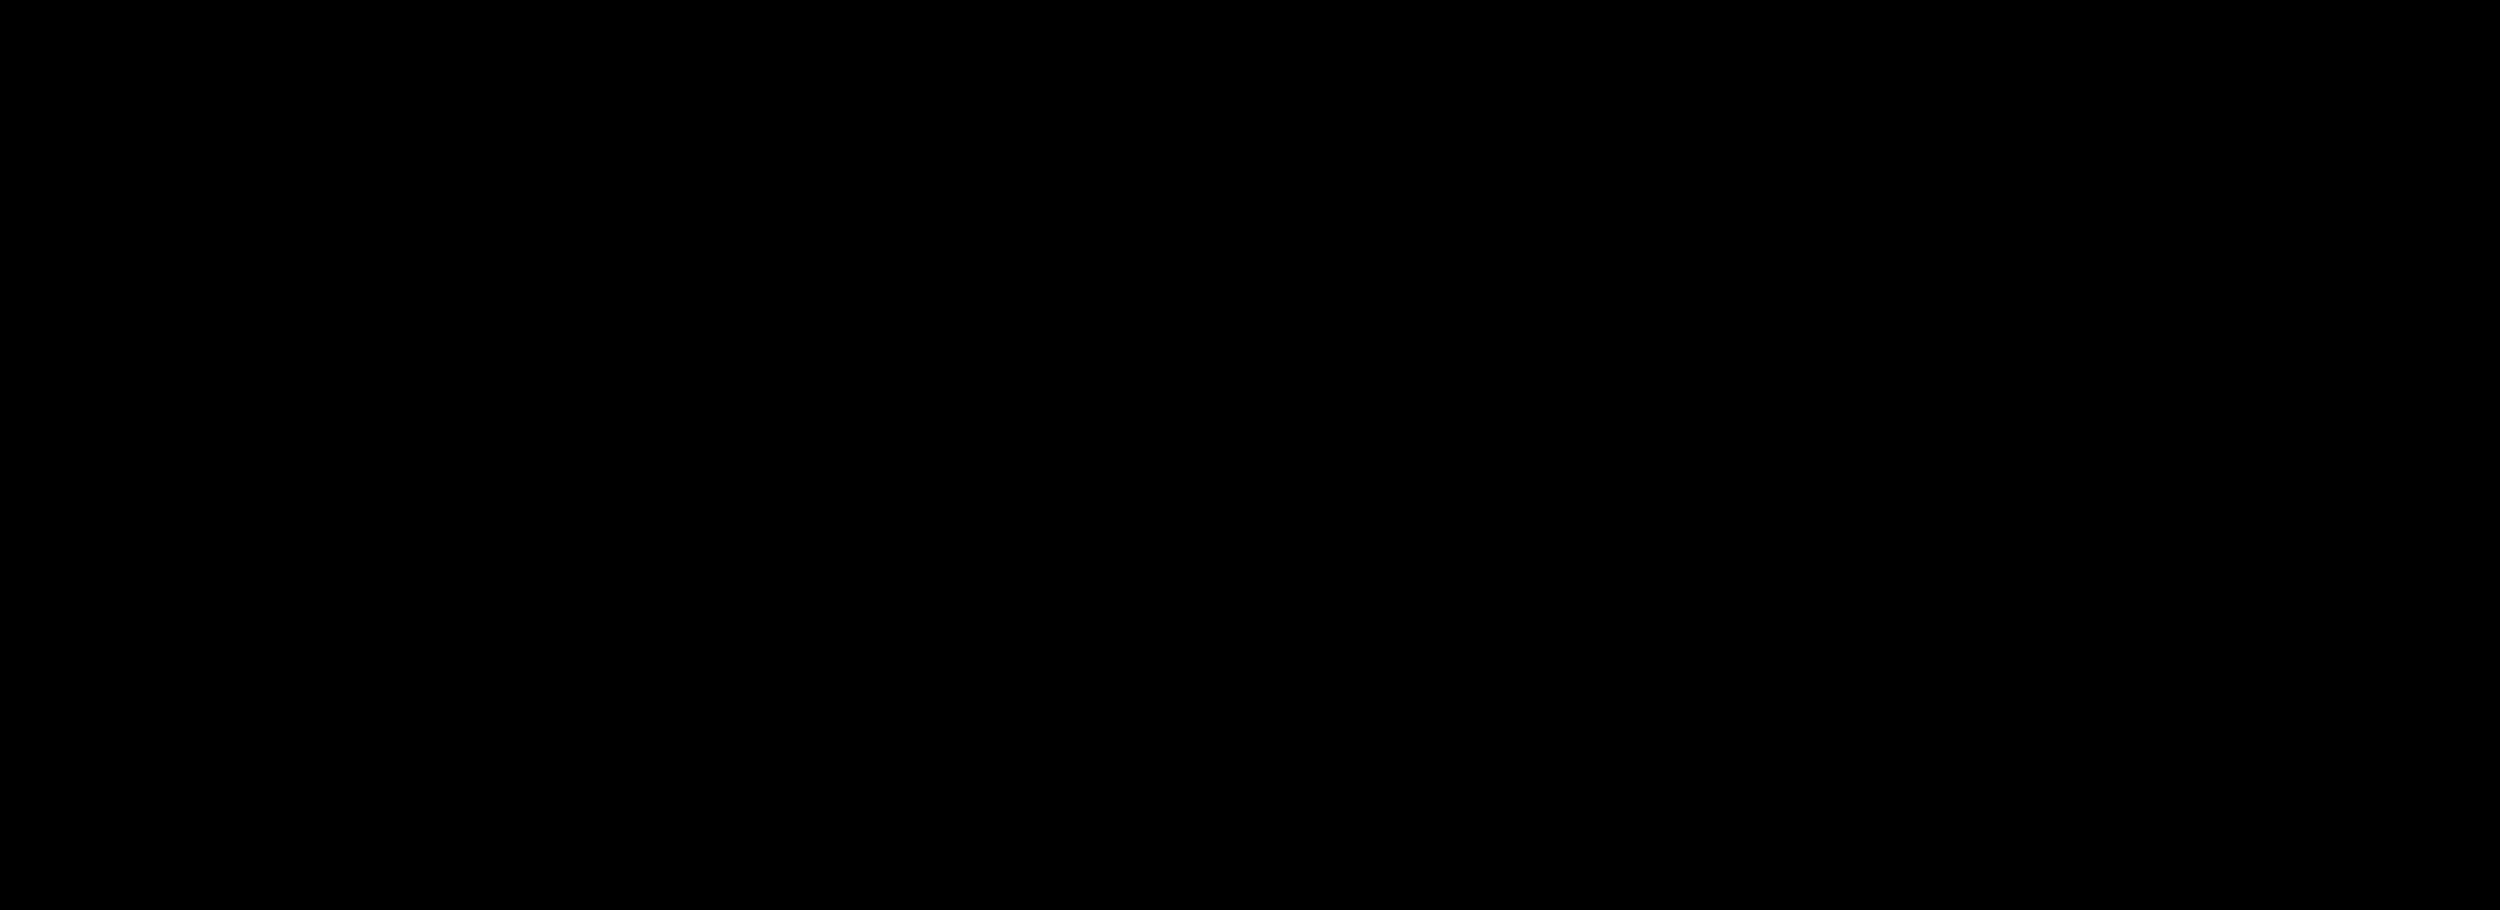 unity3d-logo.png